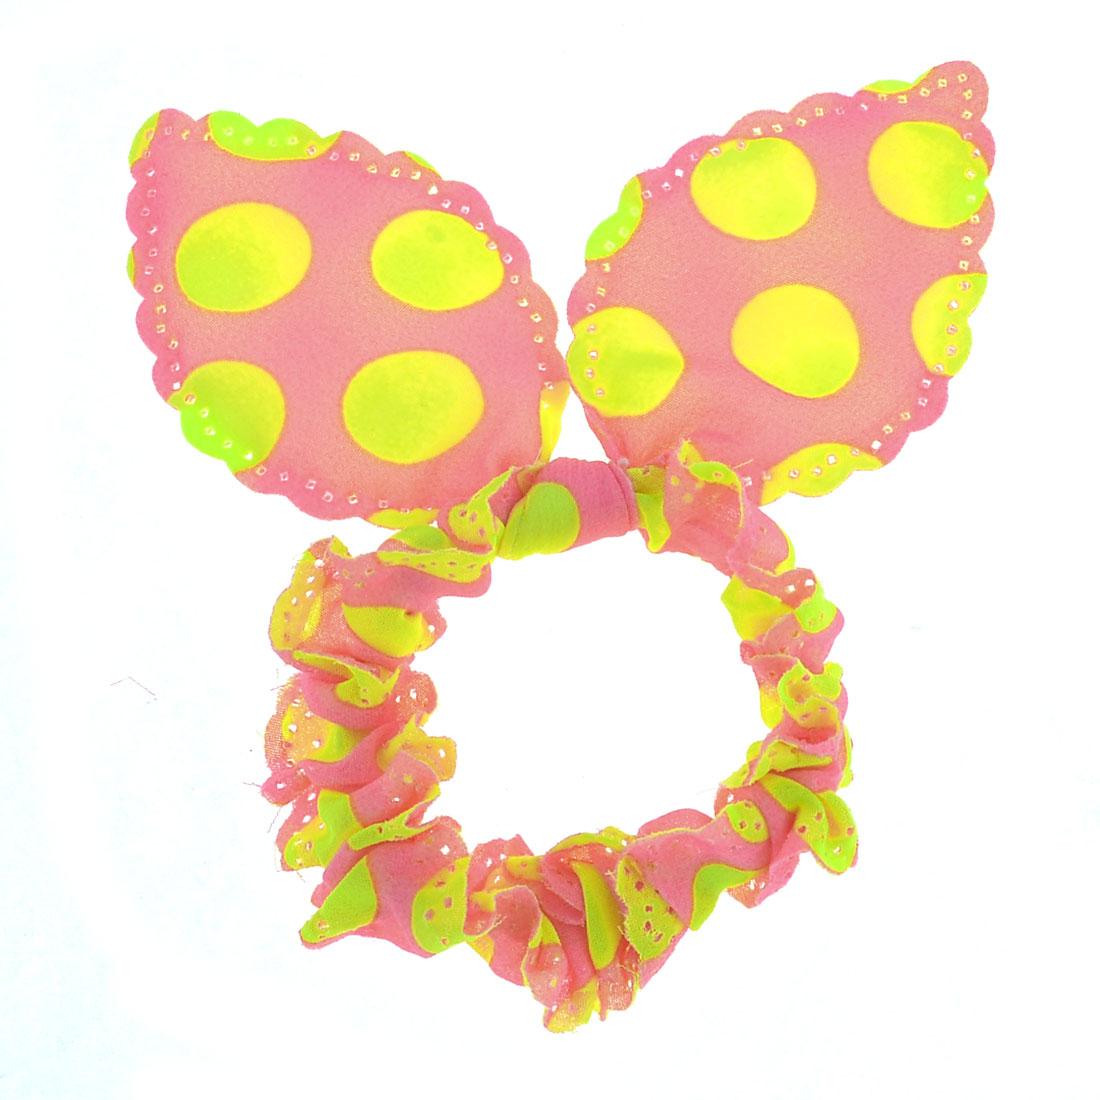 Women Fluorescent Yellow Dots Print Rabbit Ear Style Elastic Band Hair Tie Pink